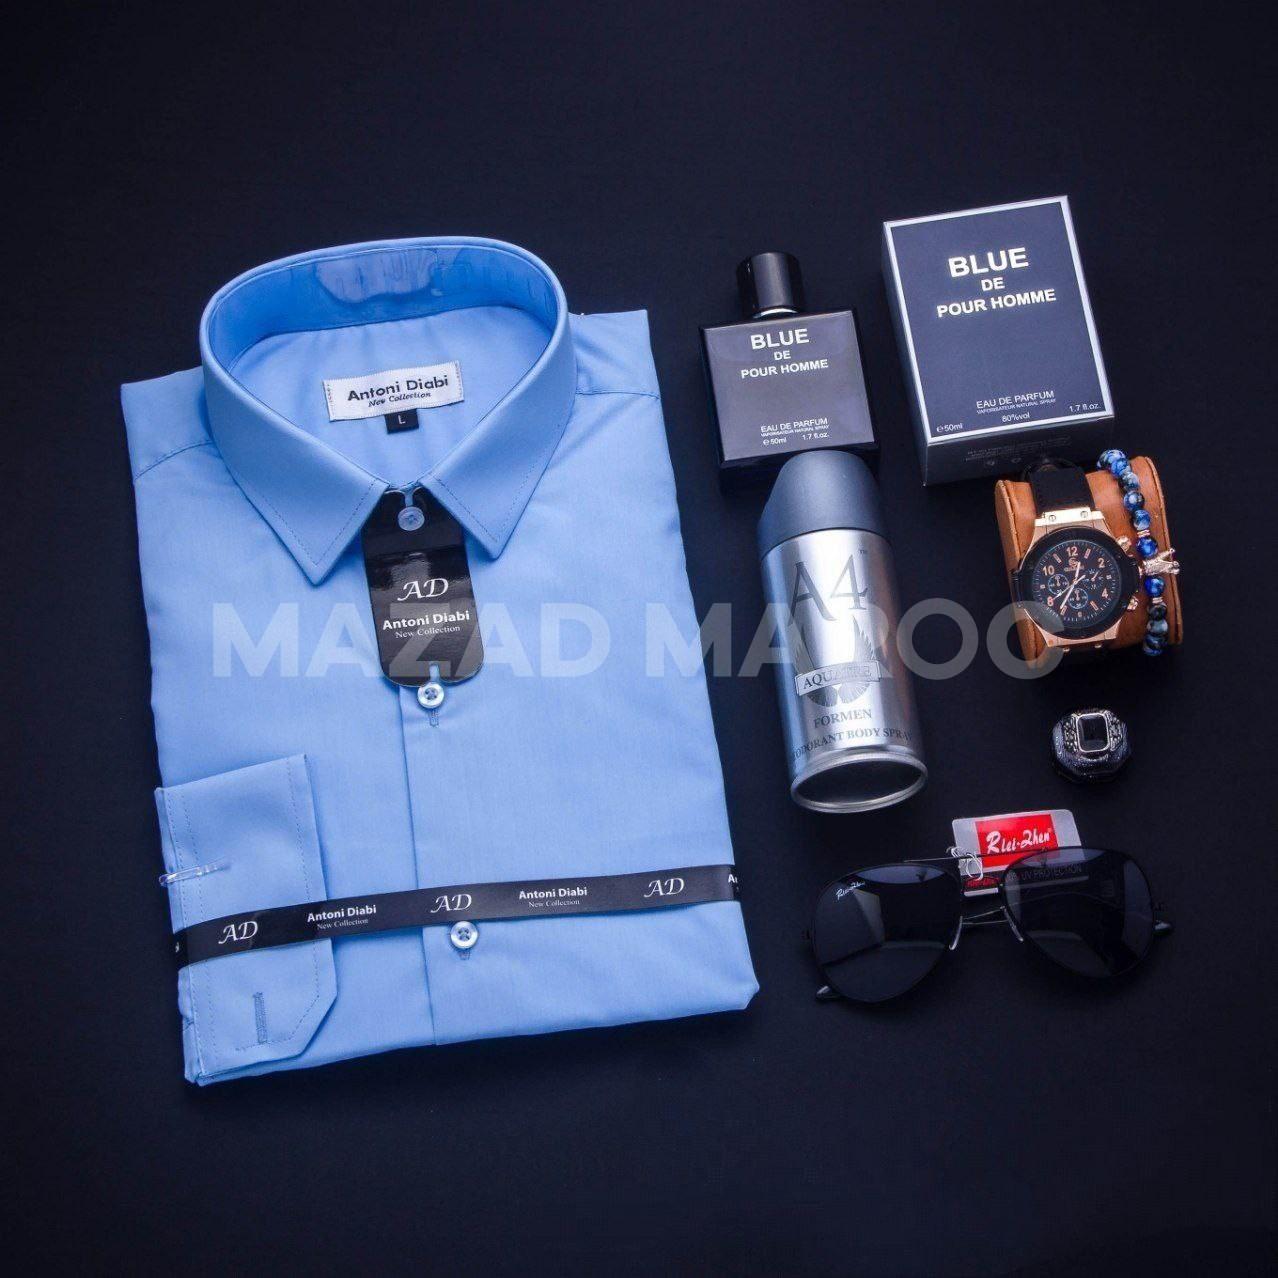 👆👆😍😍 باااك قميجة+ #ساعة جلد #براصلي #نظارة #دودورون #ريحة #خاتم Taille:S/M/L/XL /XXL /XXXL              Prix 299 DH 😍😍 Livraison gratuite a Casablanca